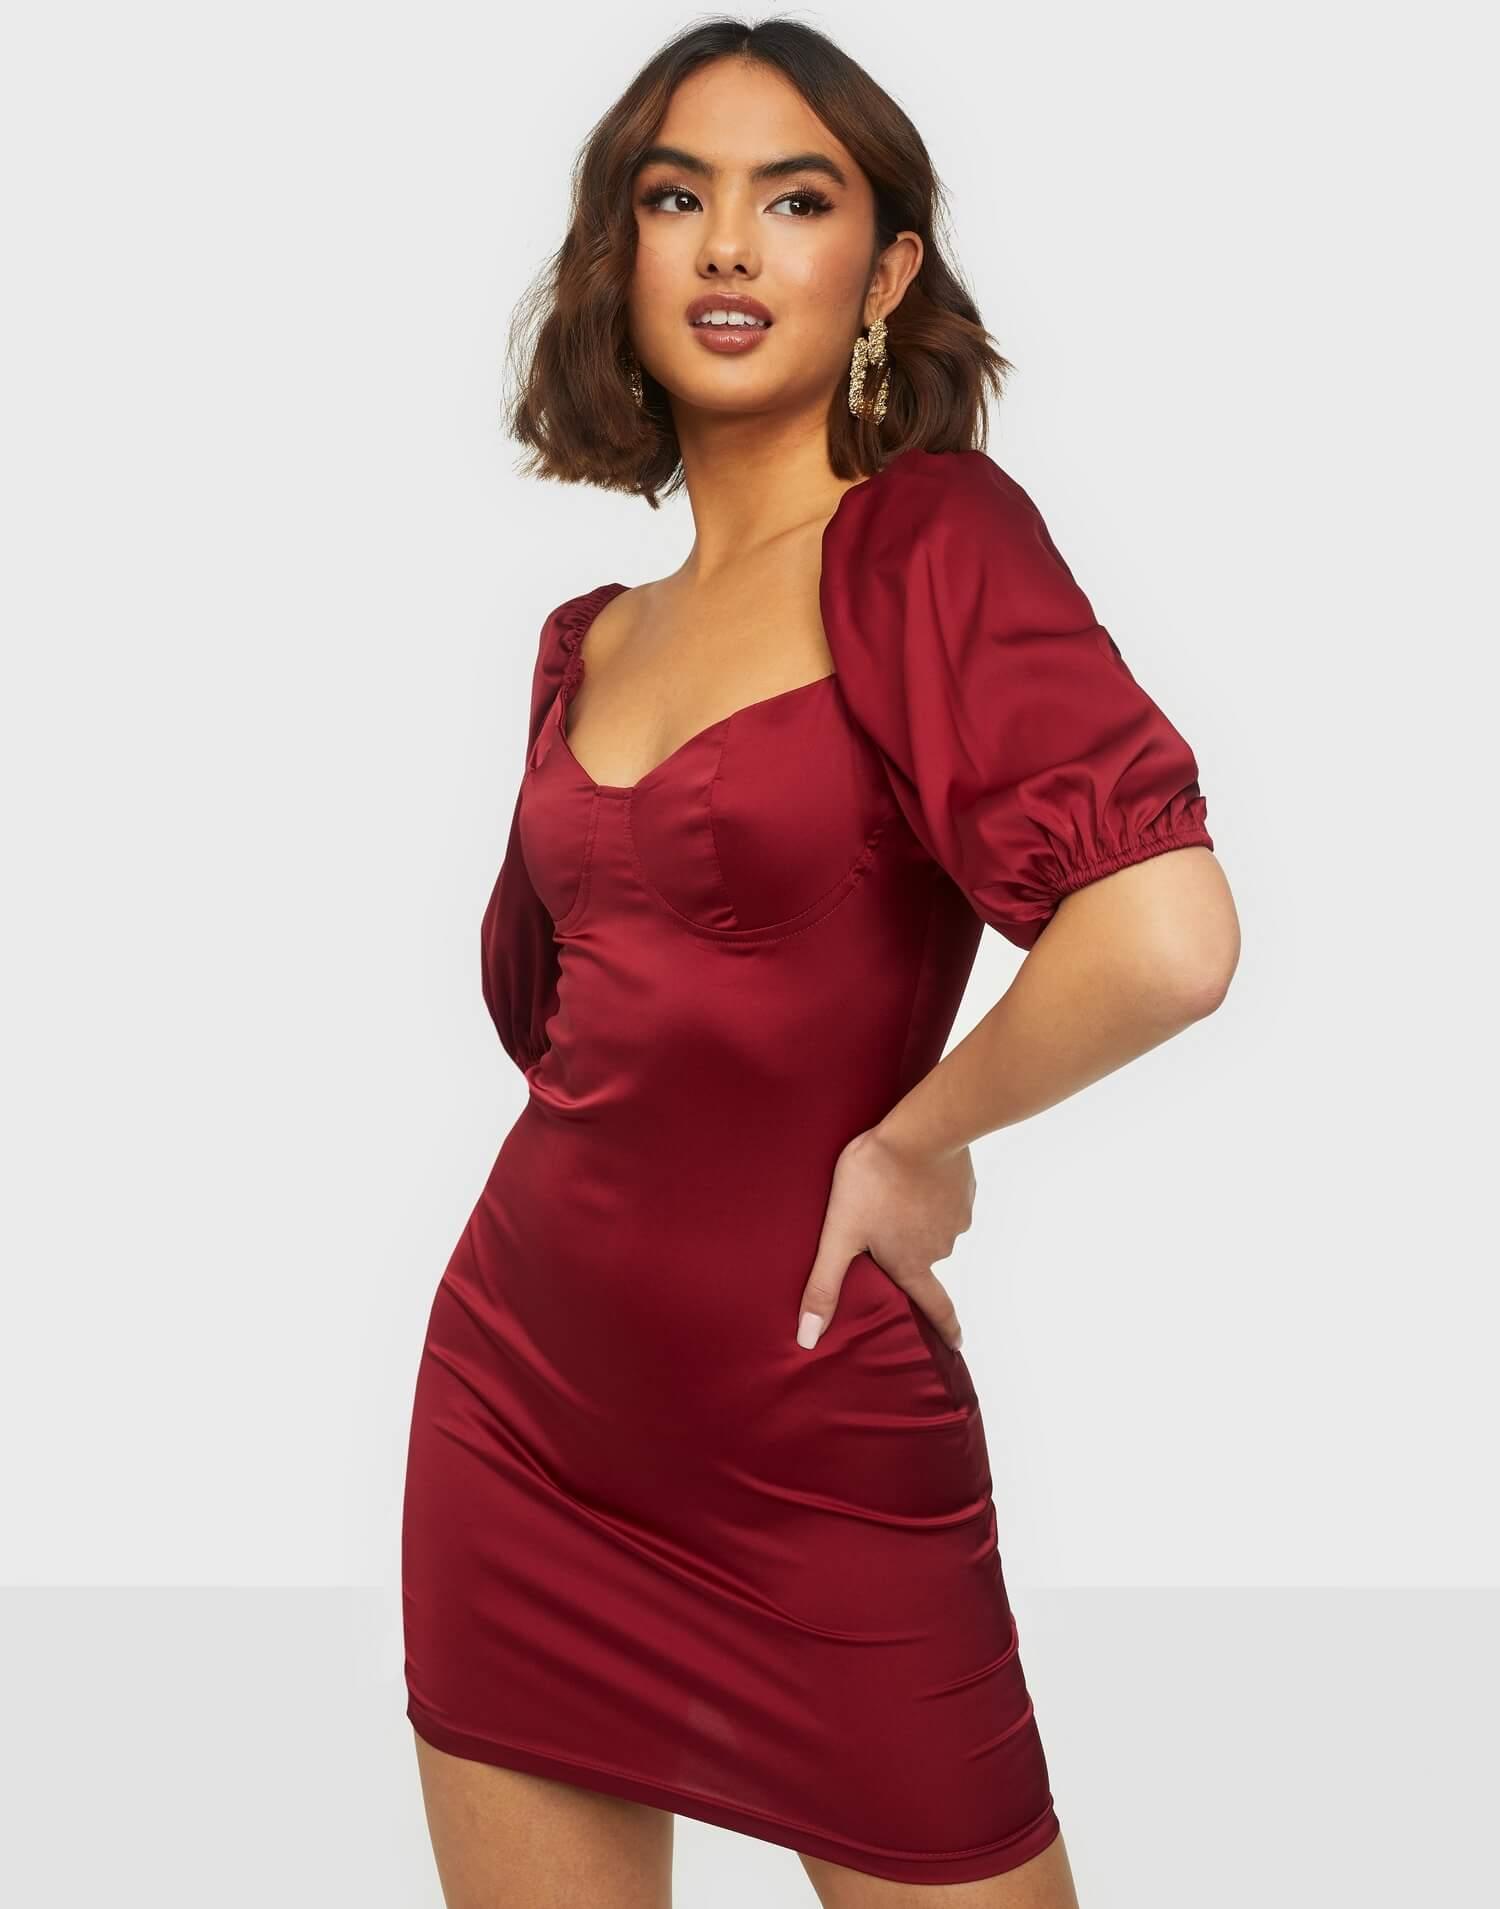 Vinröd figurnära miniklänning i silke med puffärmar.